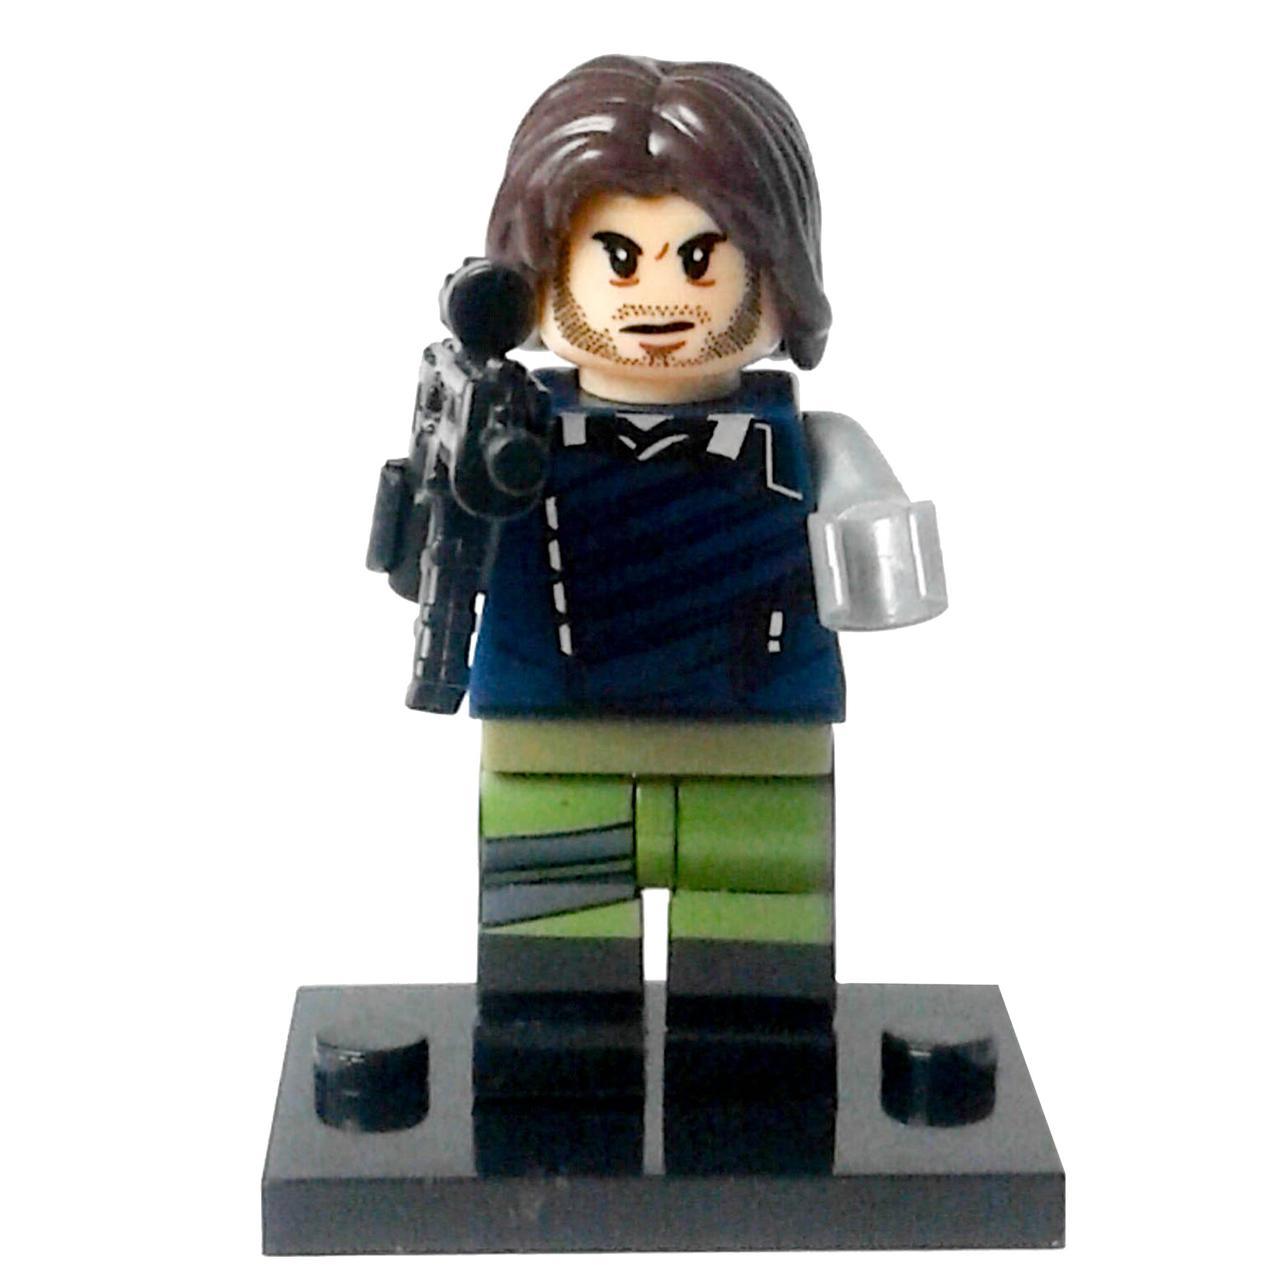 Зимний солдат Супергерой Марвел Мстители Аналог лего